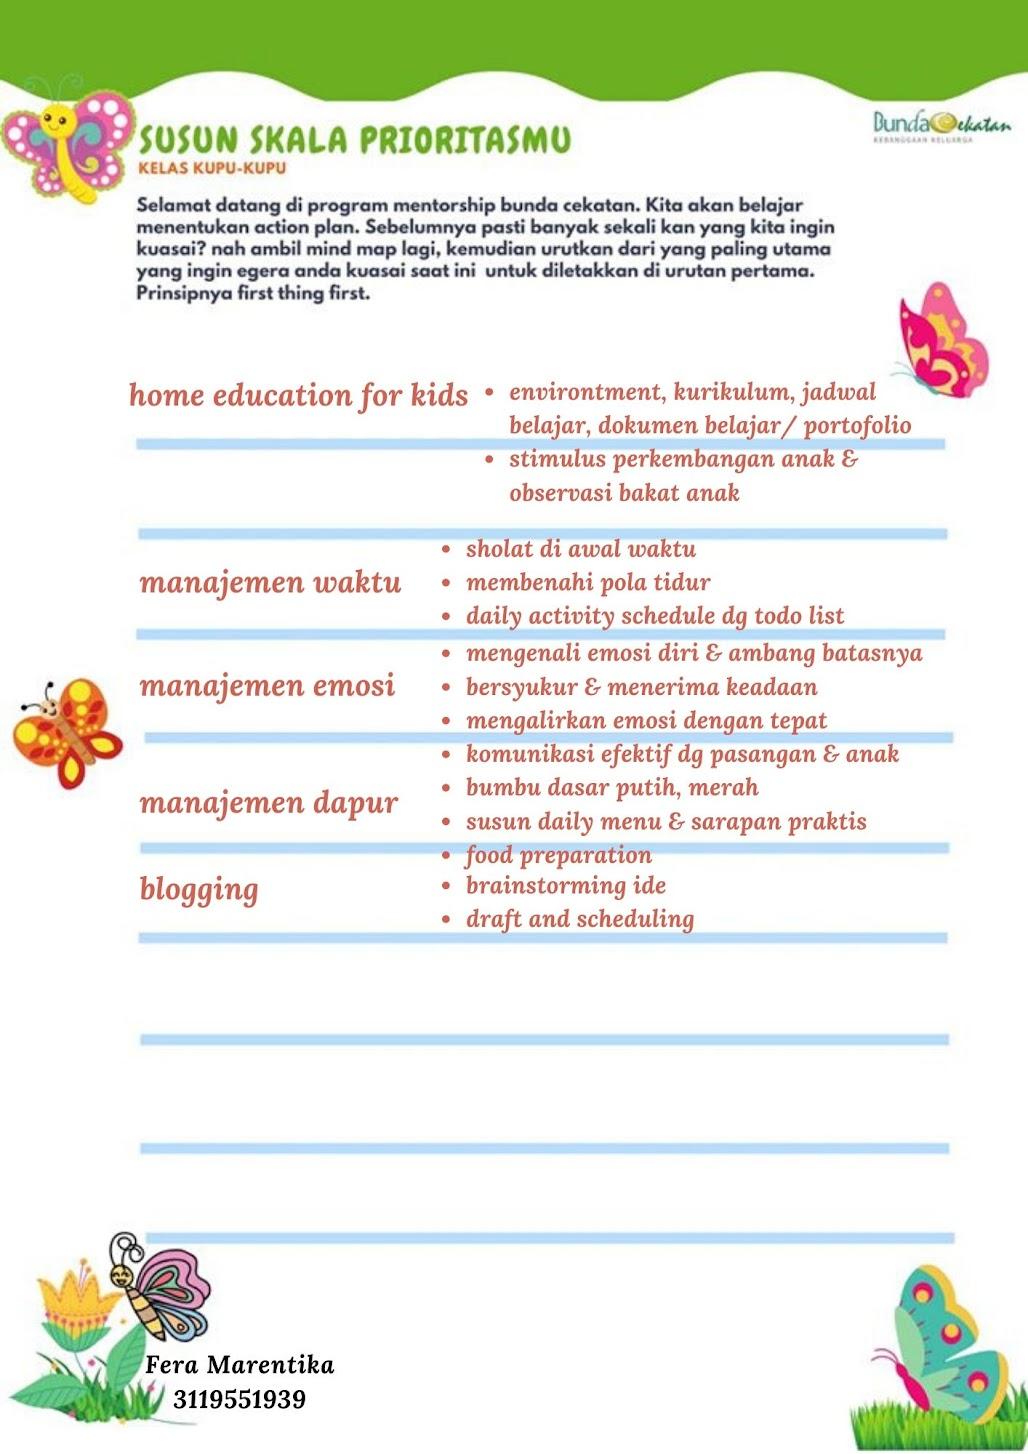 Jurnal Kupu-kupu 3: Membuat Rencana